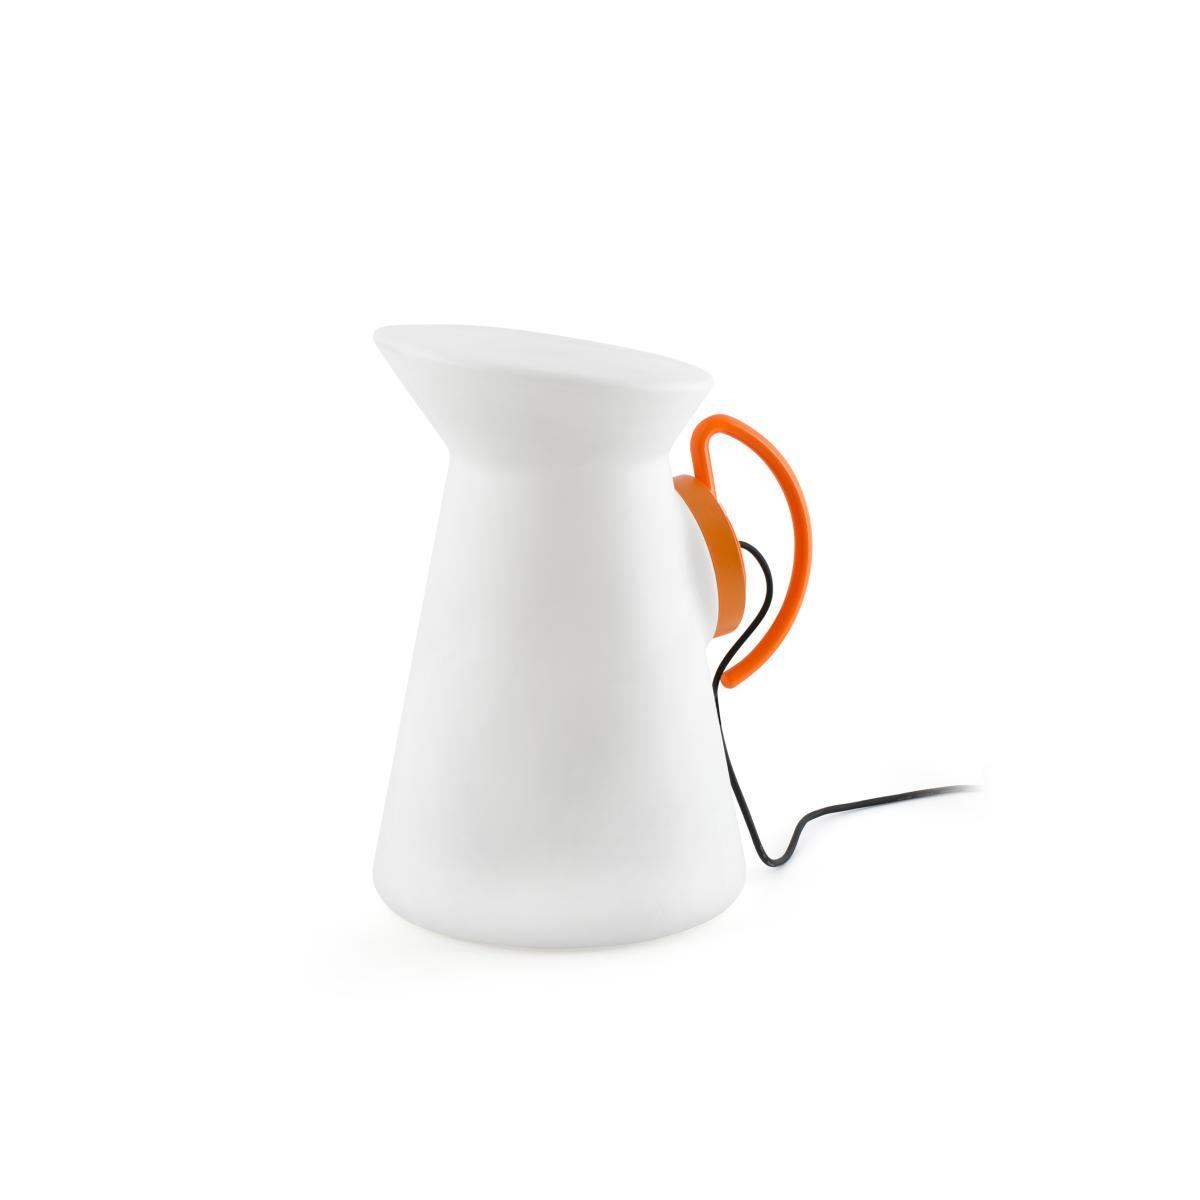 lampe ext rieure jarret faro ip44 anse orange 70477. Black Bedroom Furniture Sets. Home Design Ideas